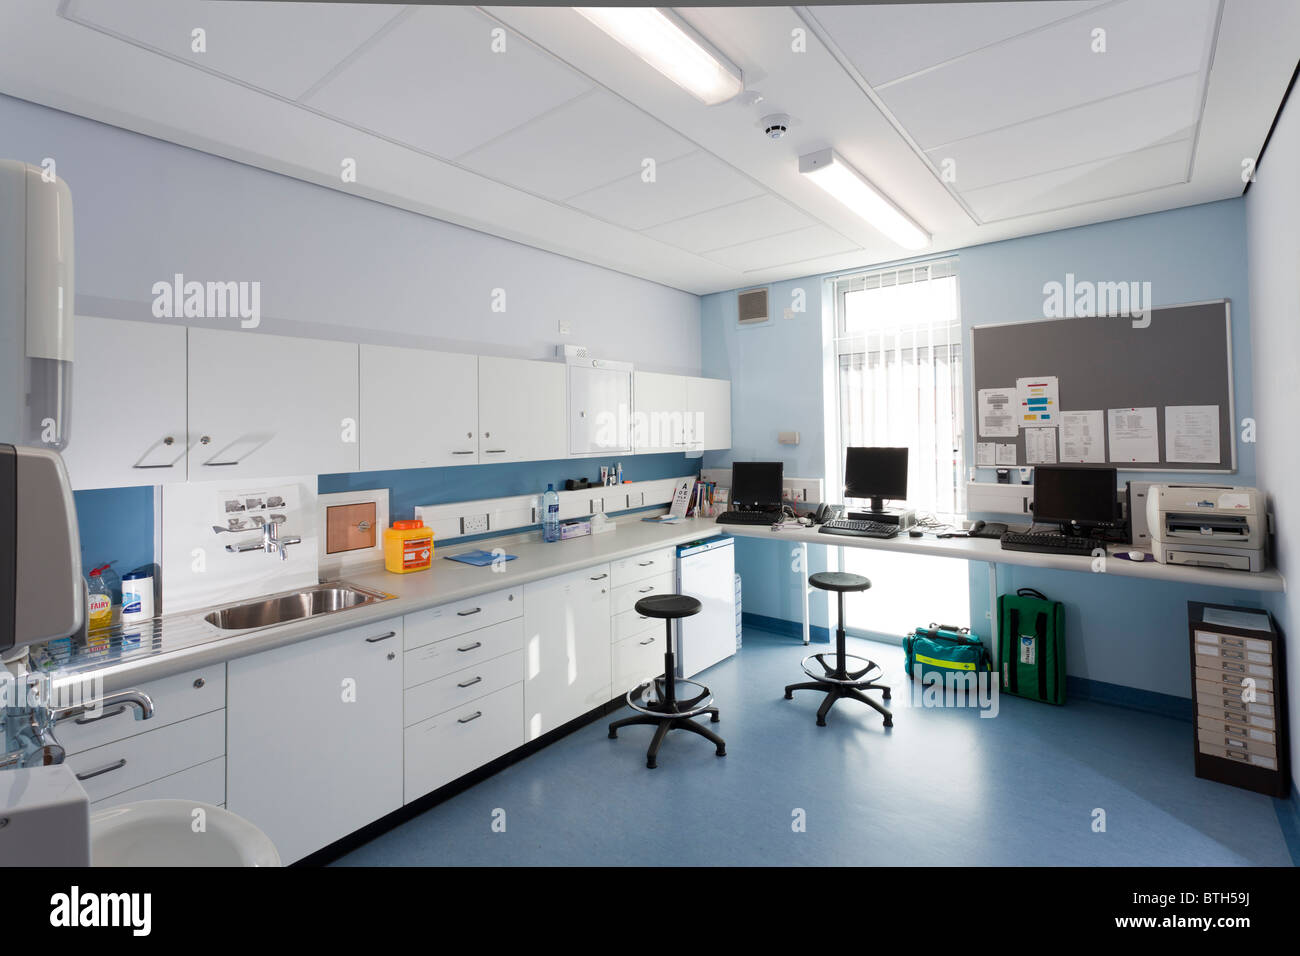 Laboratory at Gosport Medical Centre - Stock Image